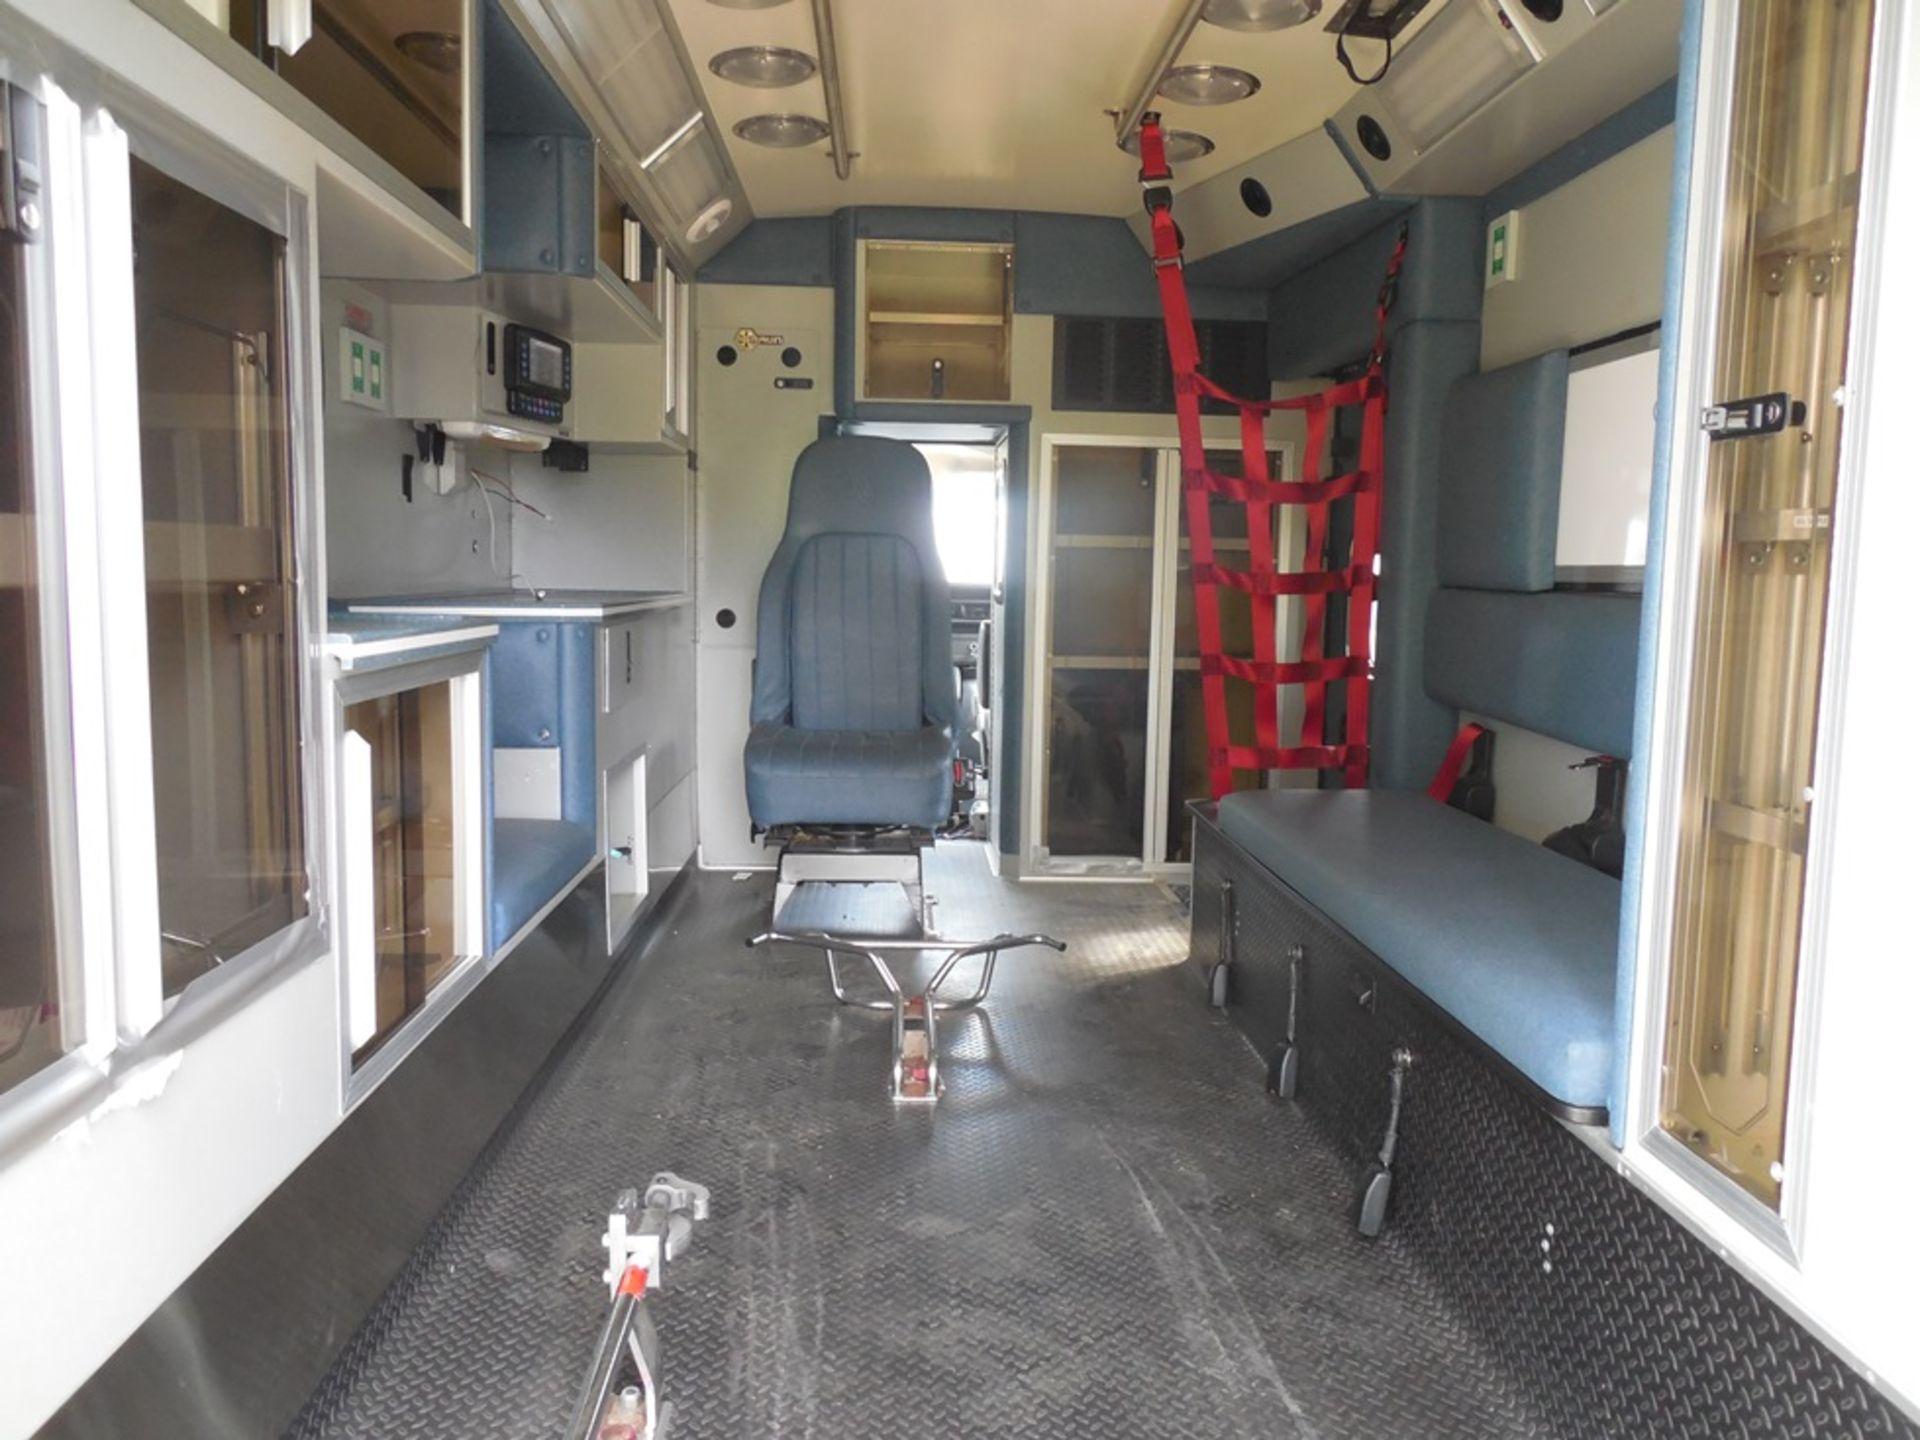 2011 Chev dsl. box ambulance Baun Body 202,680 miles vin# 1GB6G5CL5B1141656 - Image 6 of 6